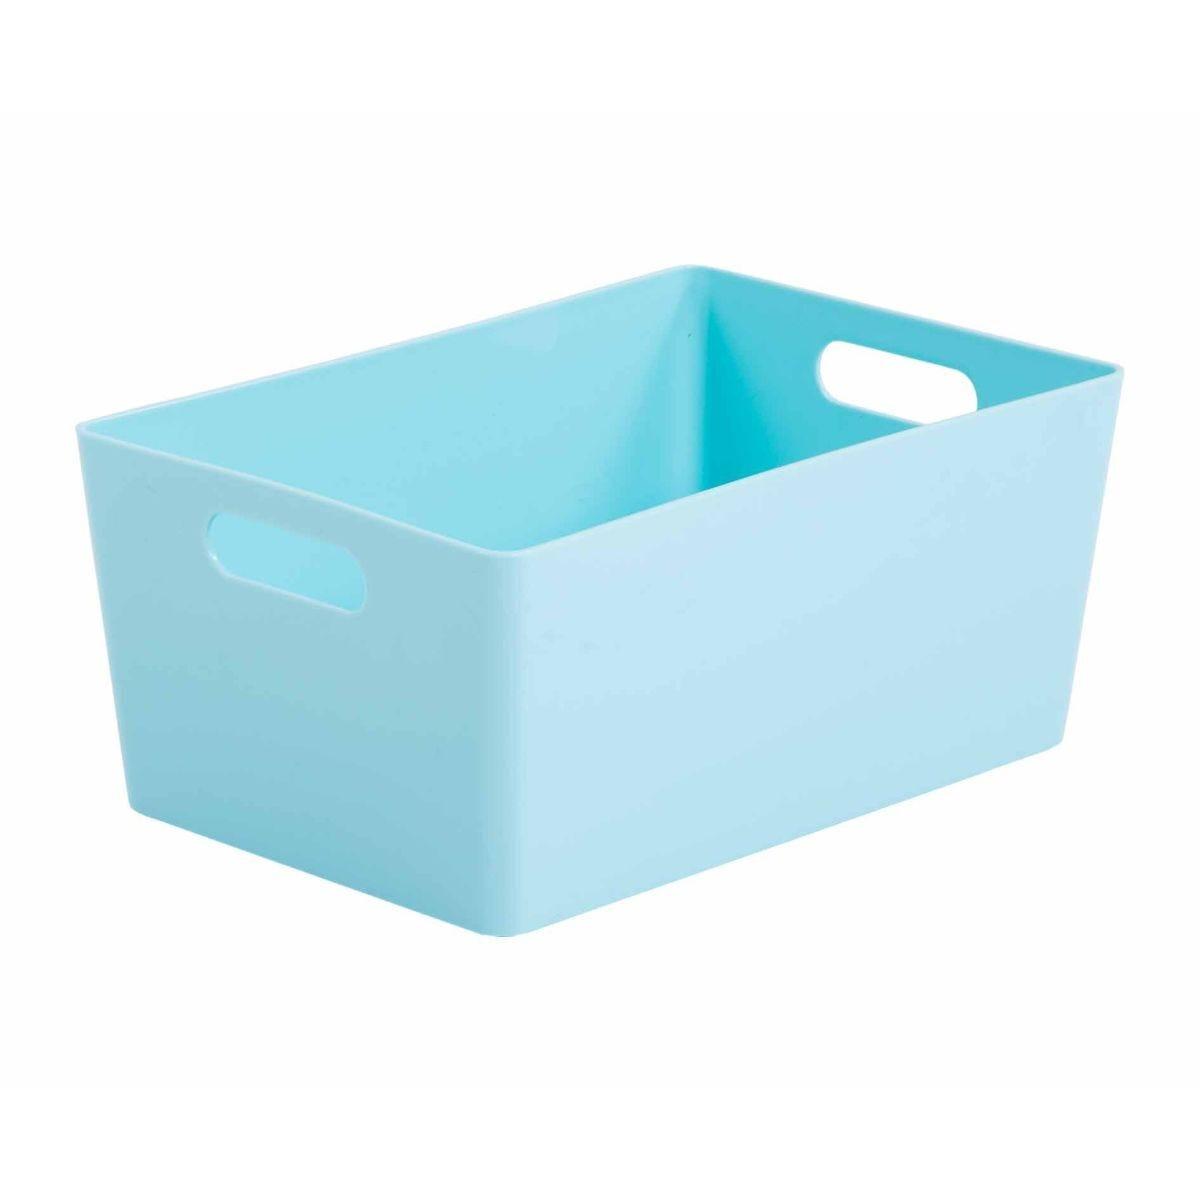 Wham Studio Basket 4.02 Blue